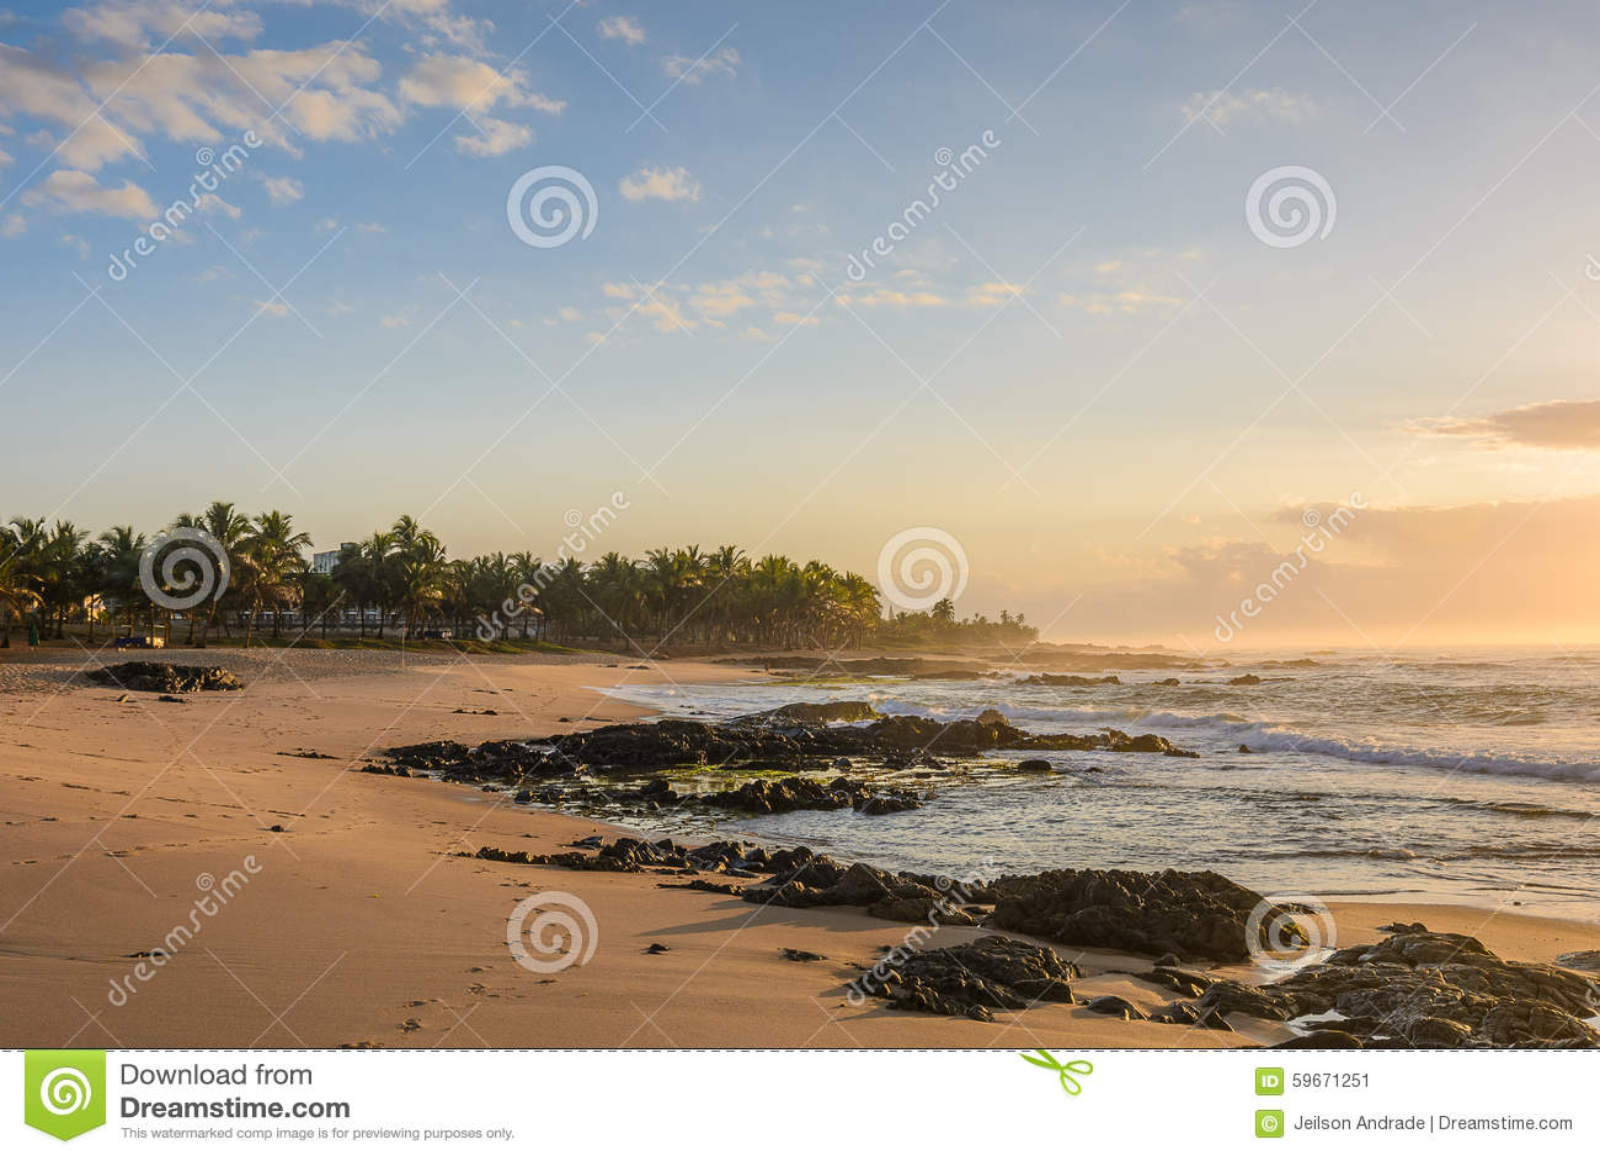 Sunrise in Itapuã Beach - Salvador - Bahia - Brazil